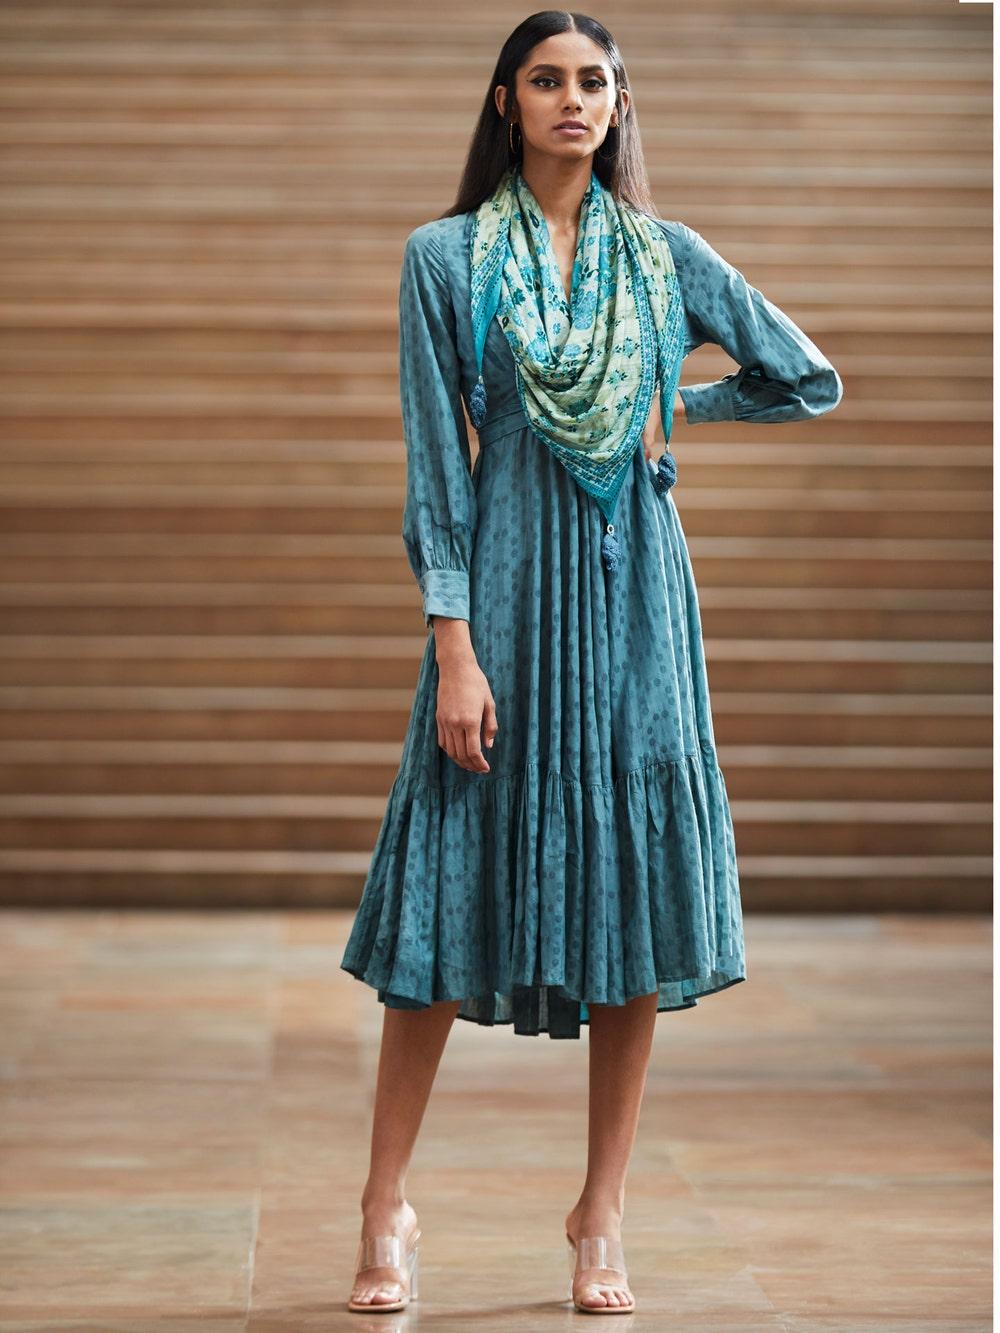 Teal Blue Anarkali Dress With Scarf